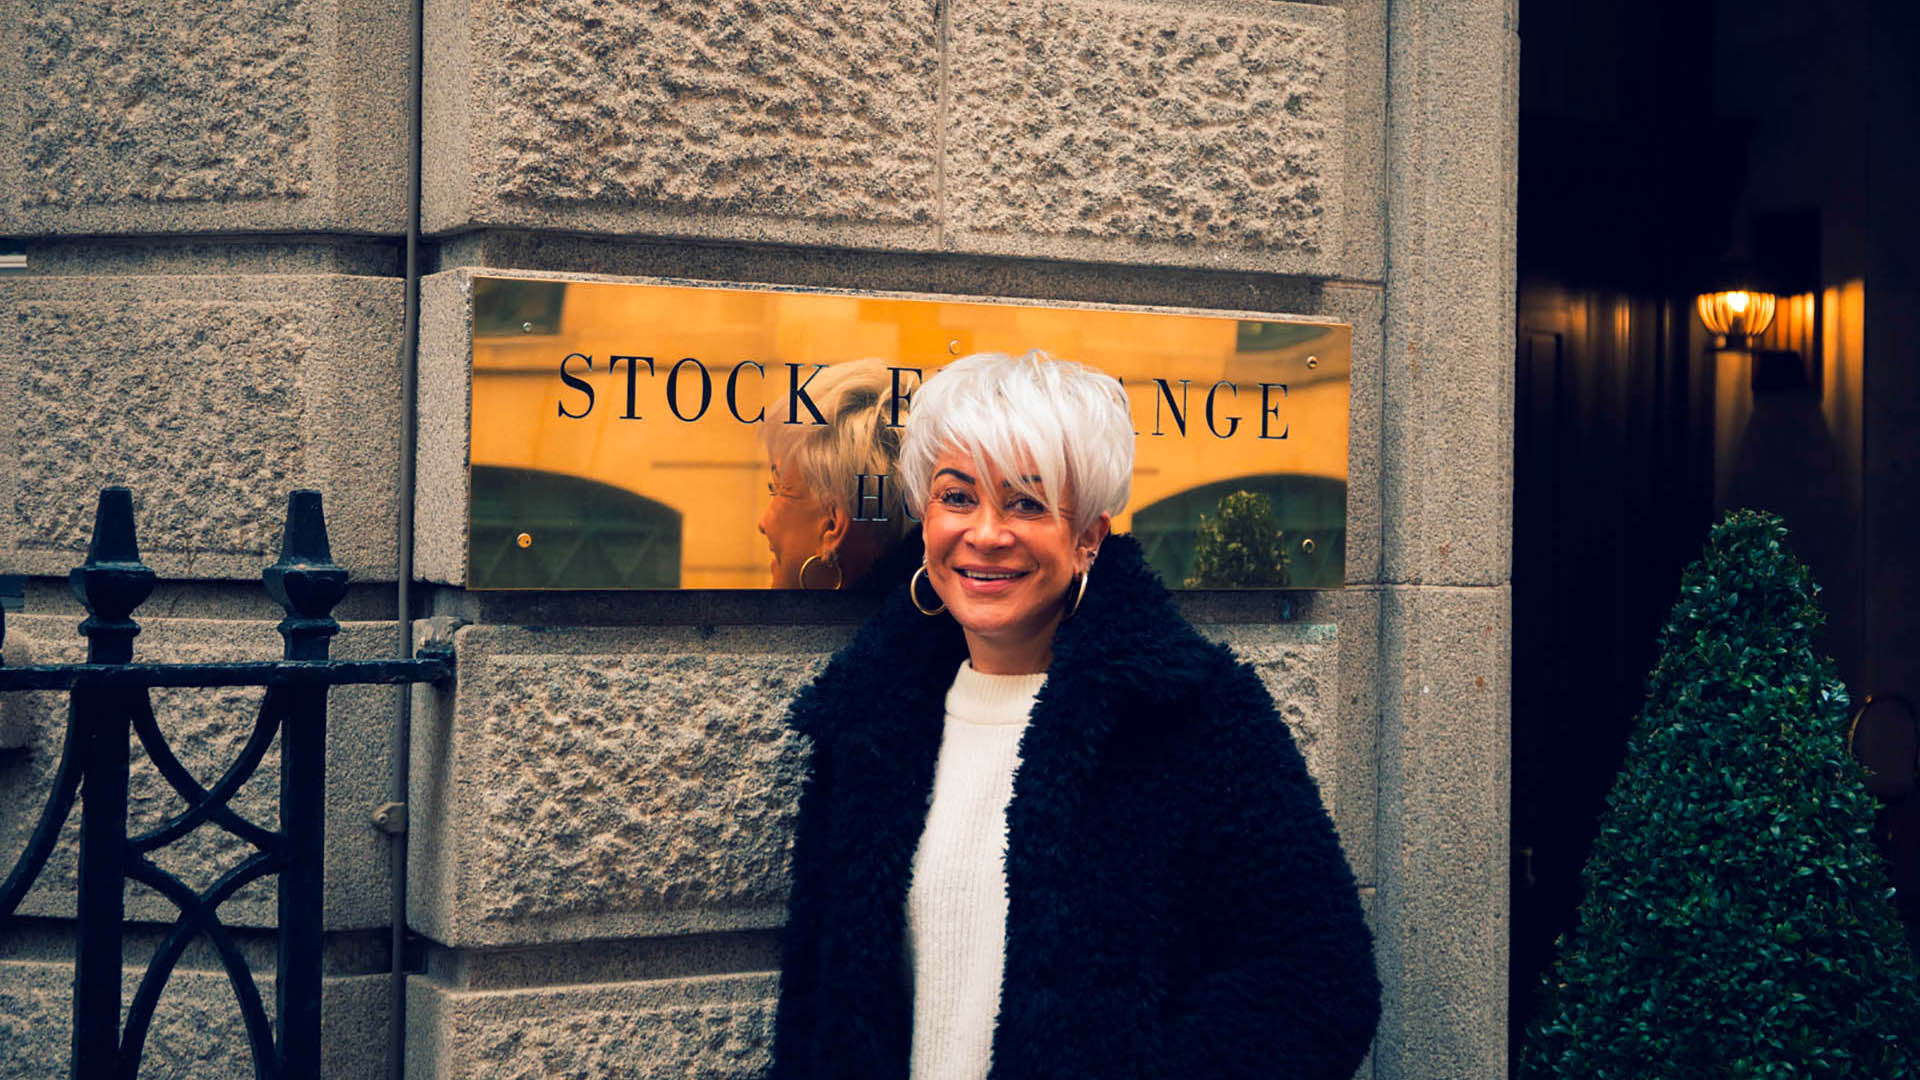 Manchester Stock Exchange Liz Taylor Consultancy